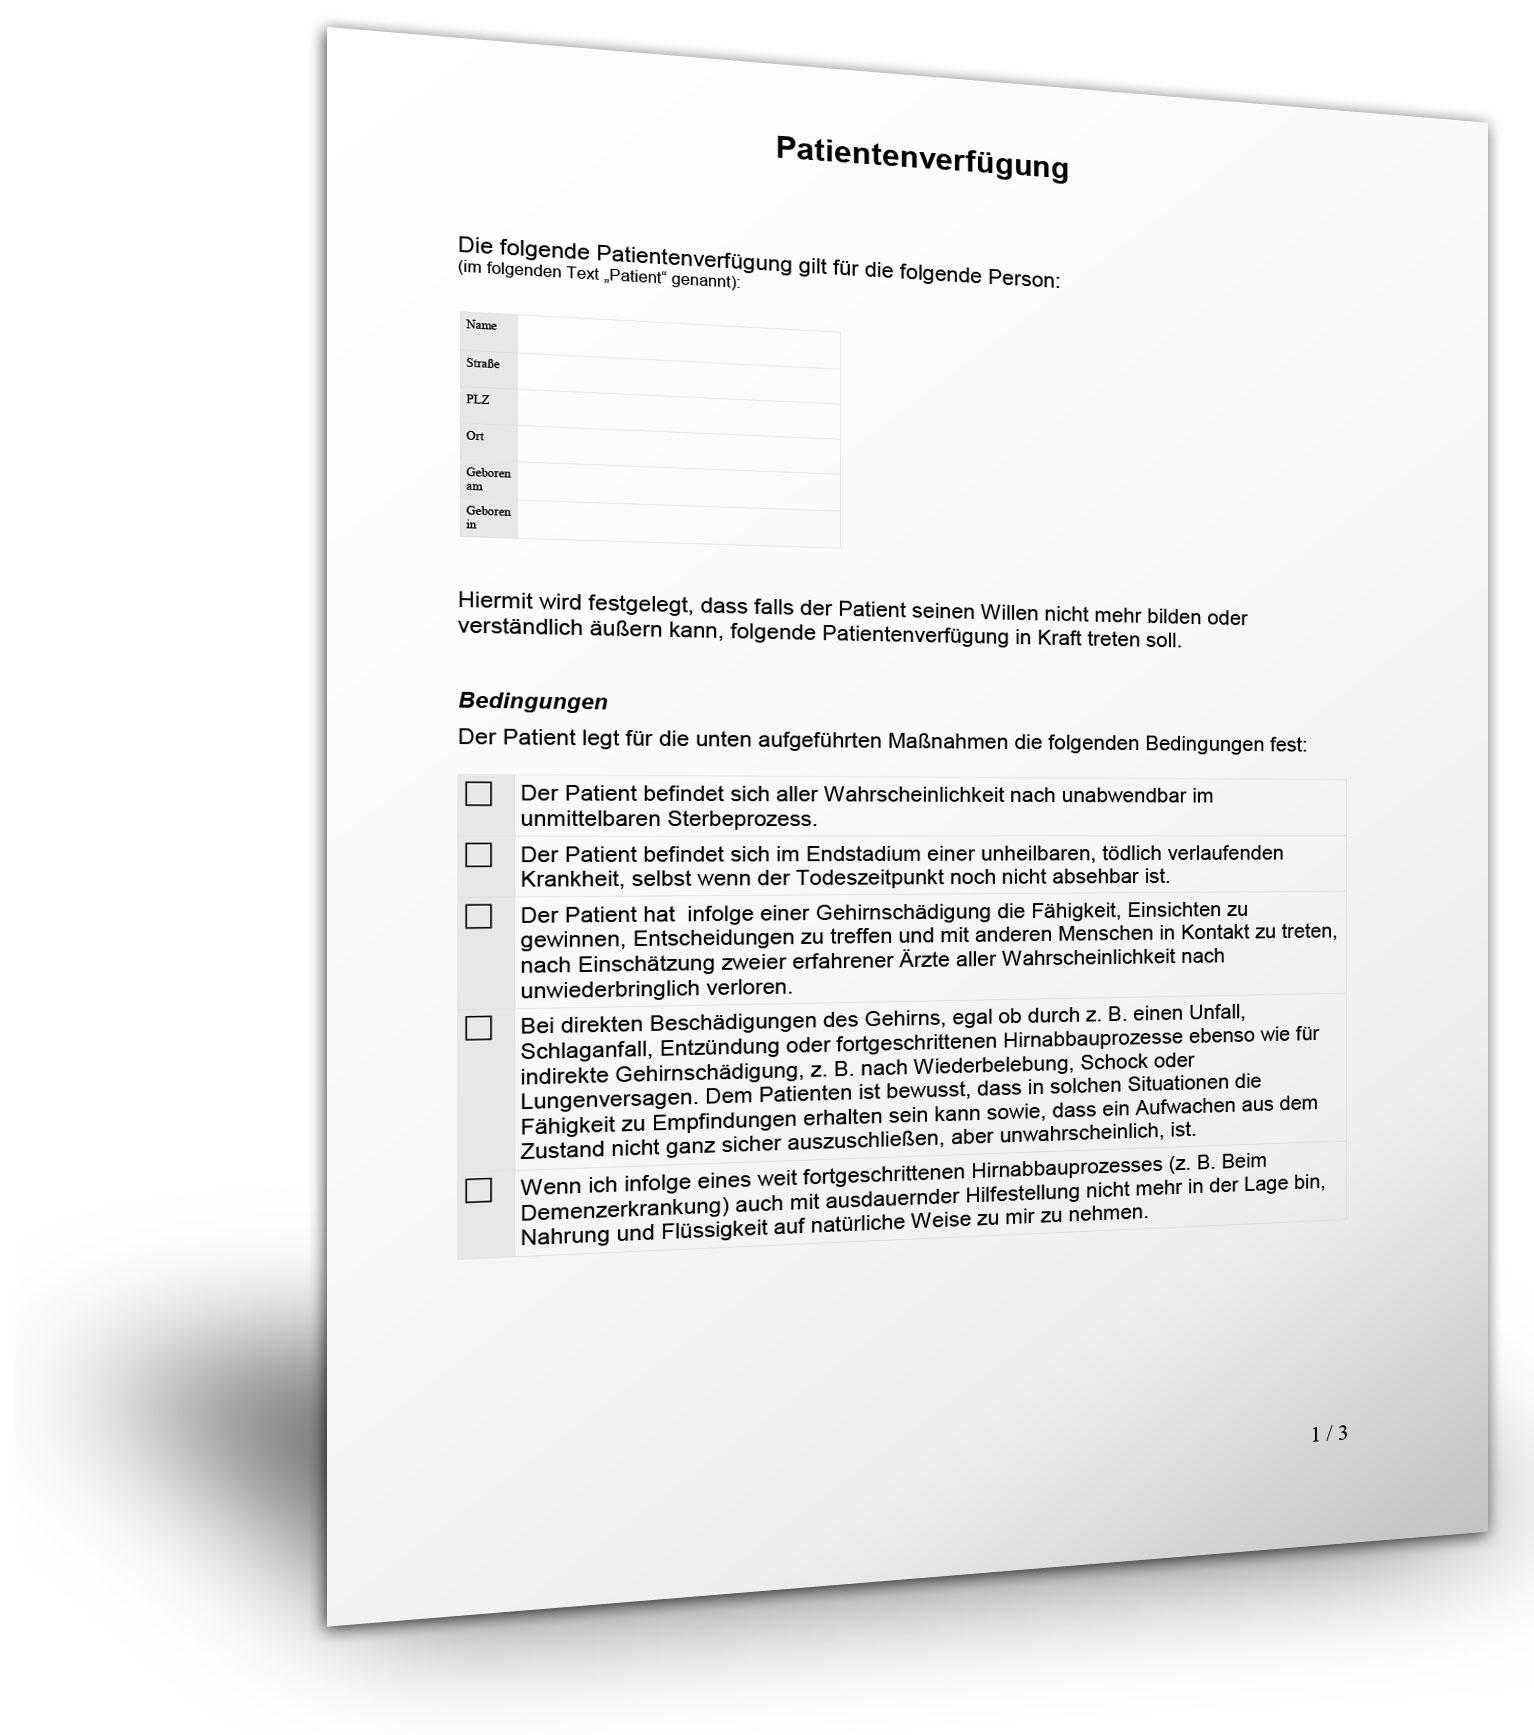 patientenverfuegungsformular muster - Patientenverfugung Muster